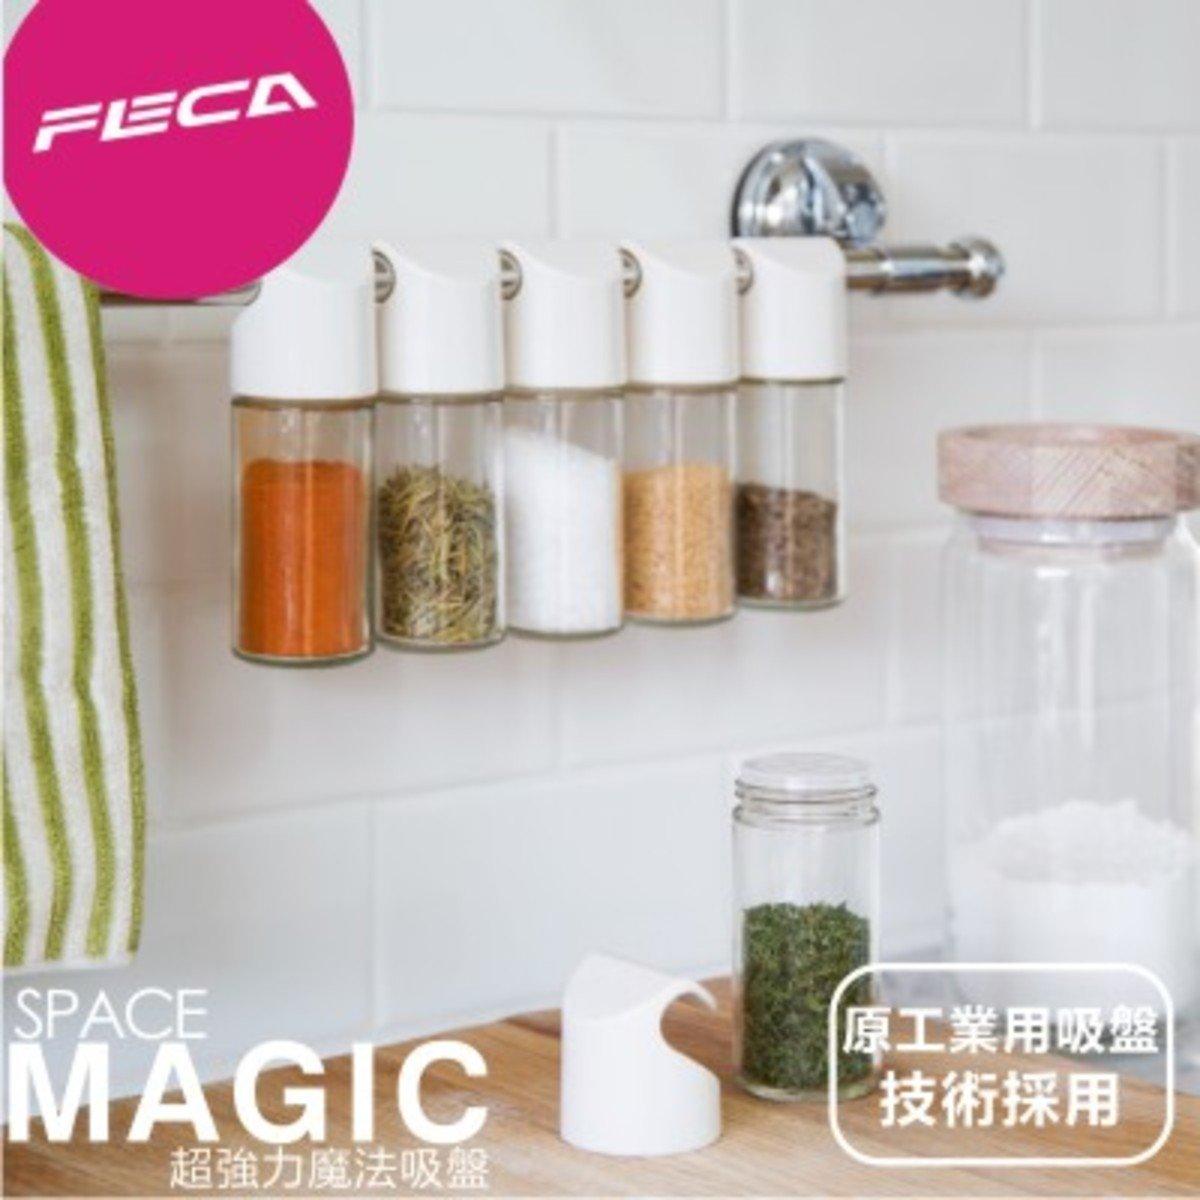 SJ1 魔法吸盤調味罐一套 (2PCS)